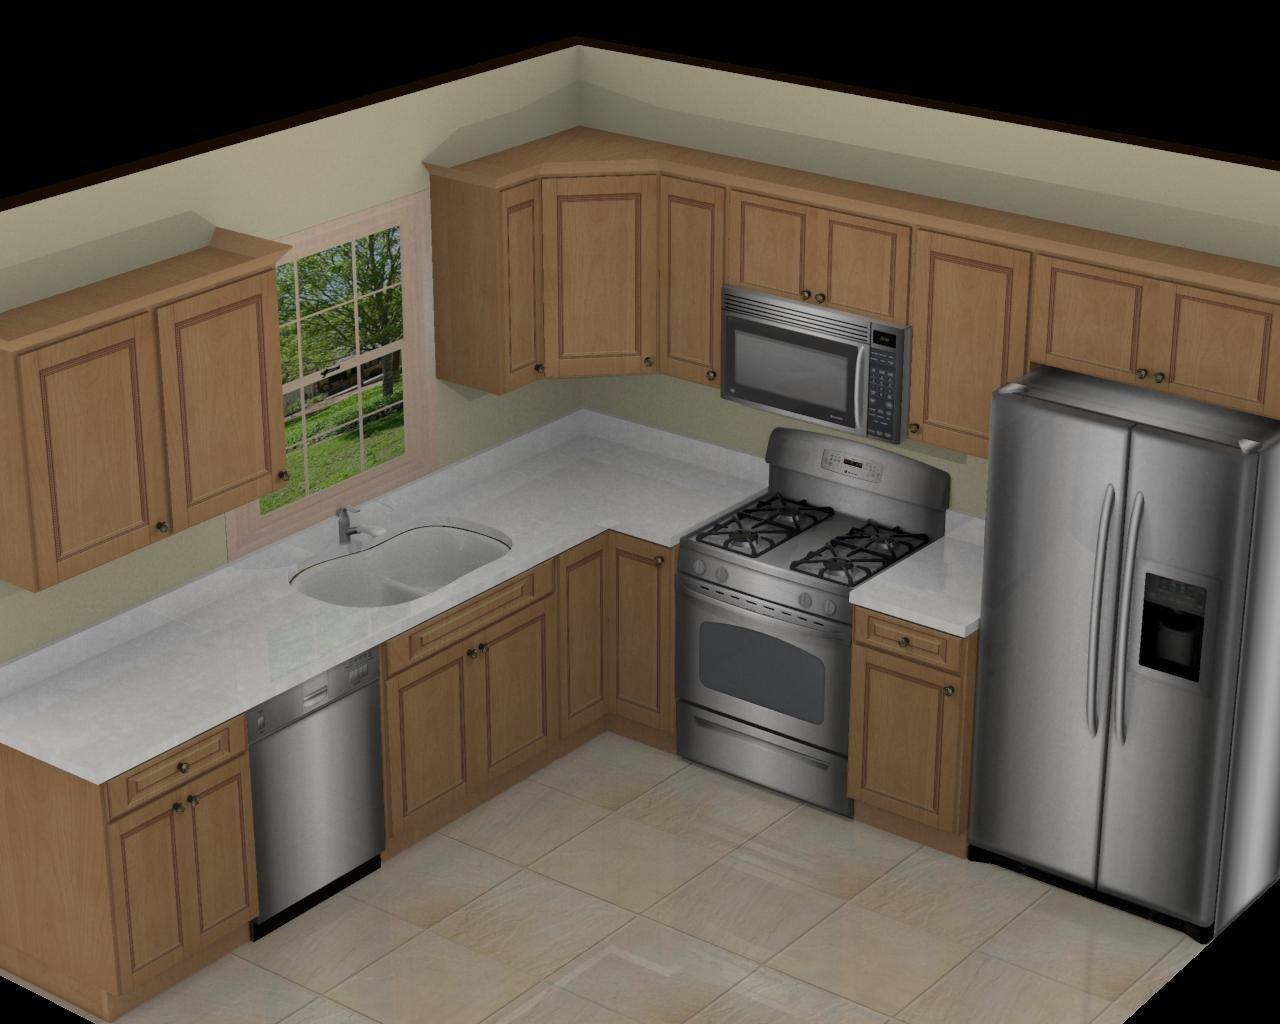 Best Ideas About X Kitchen On Pinterest Kitchen Layouts 10x10